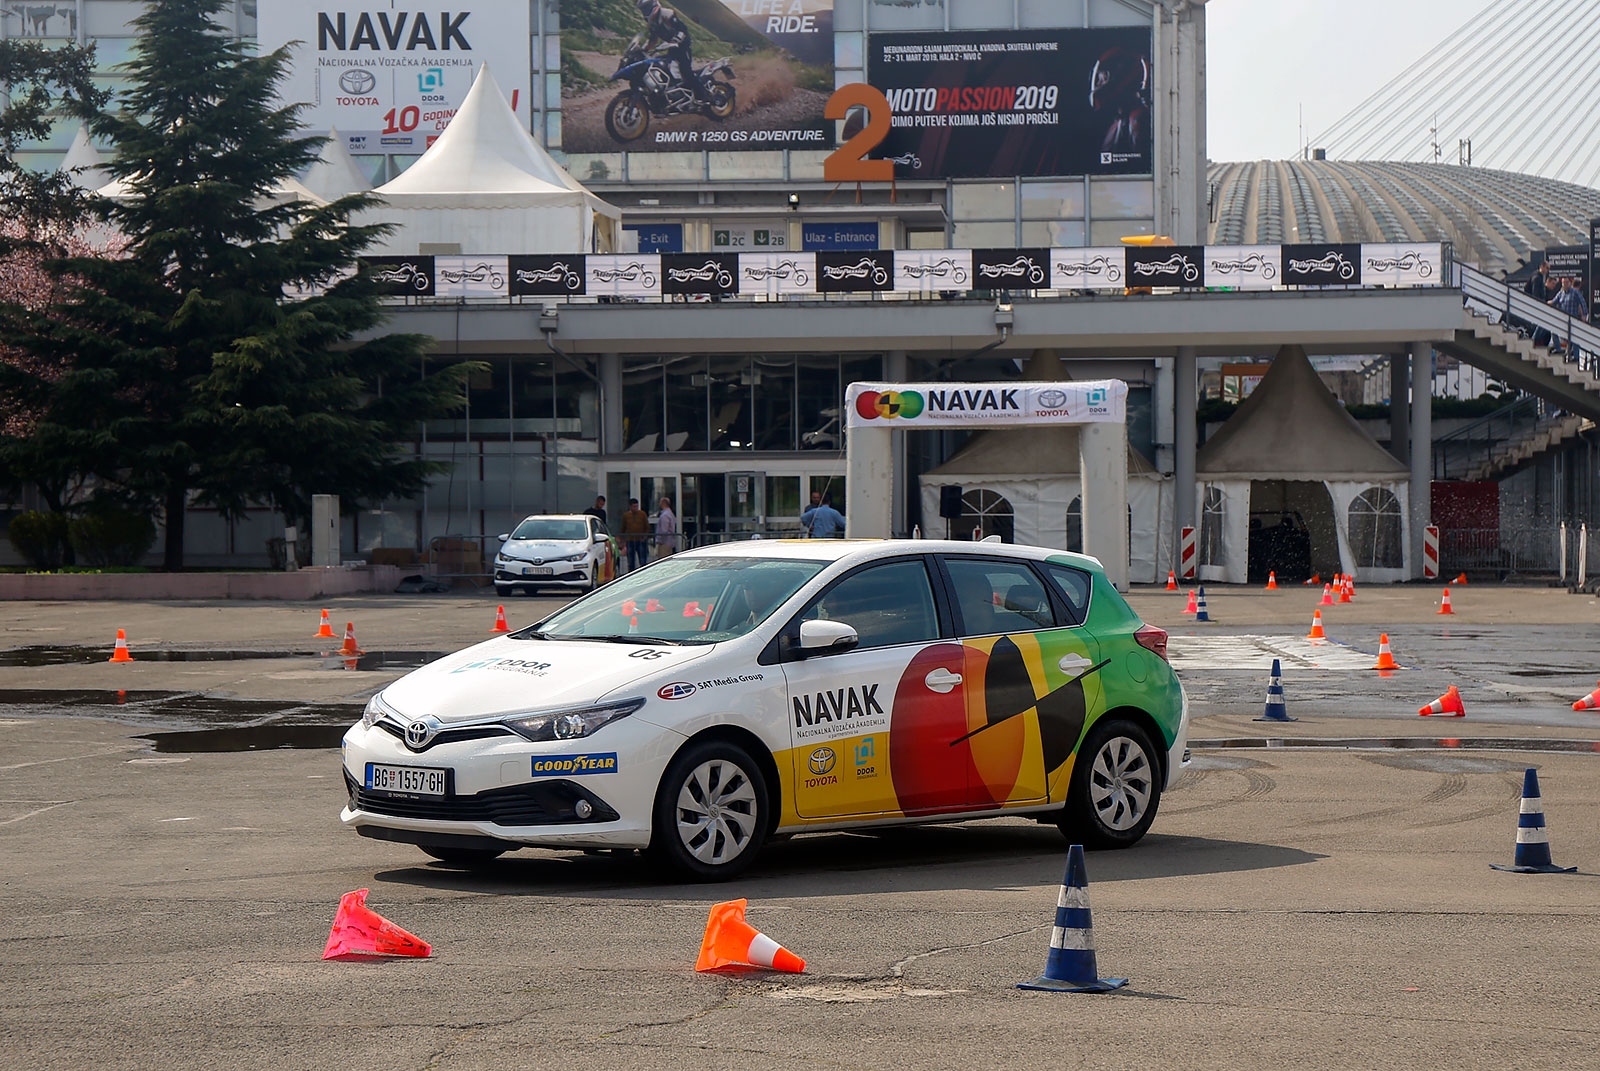 NAVAK svakodnevno praktično edukuje vozače o bezbednim tehnikama vožnje